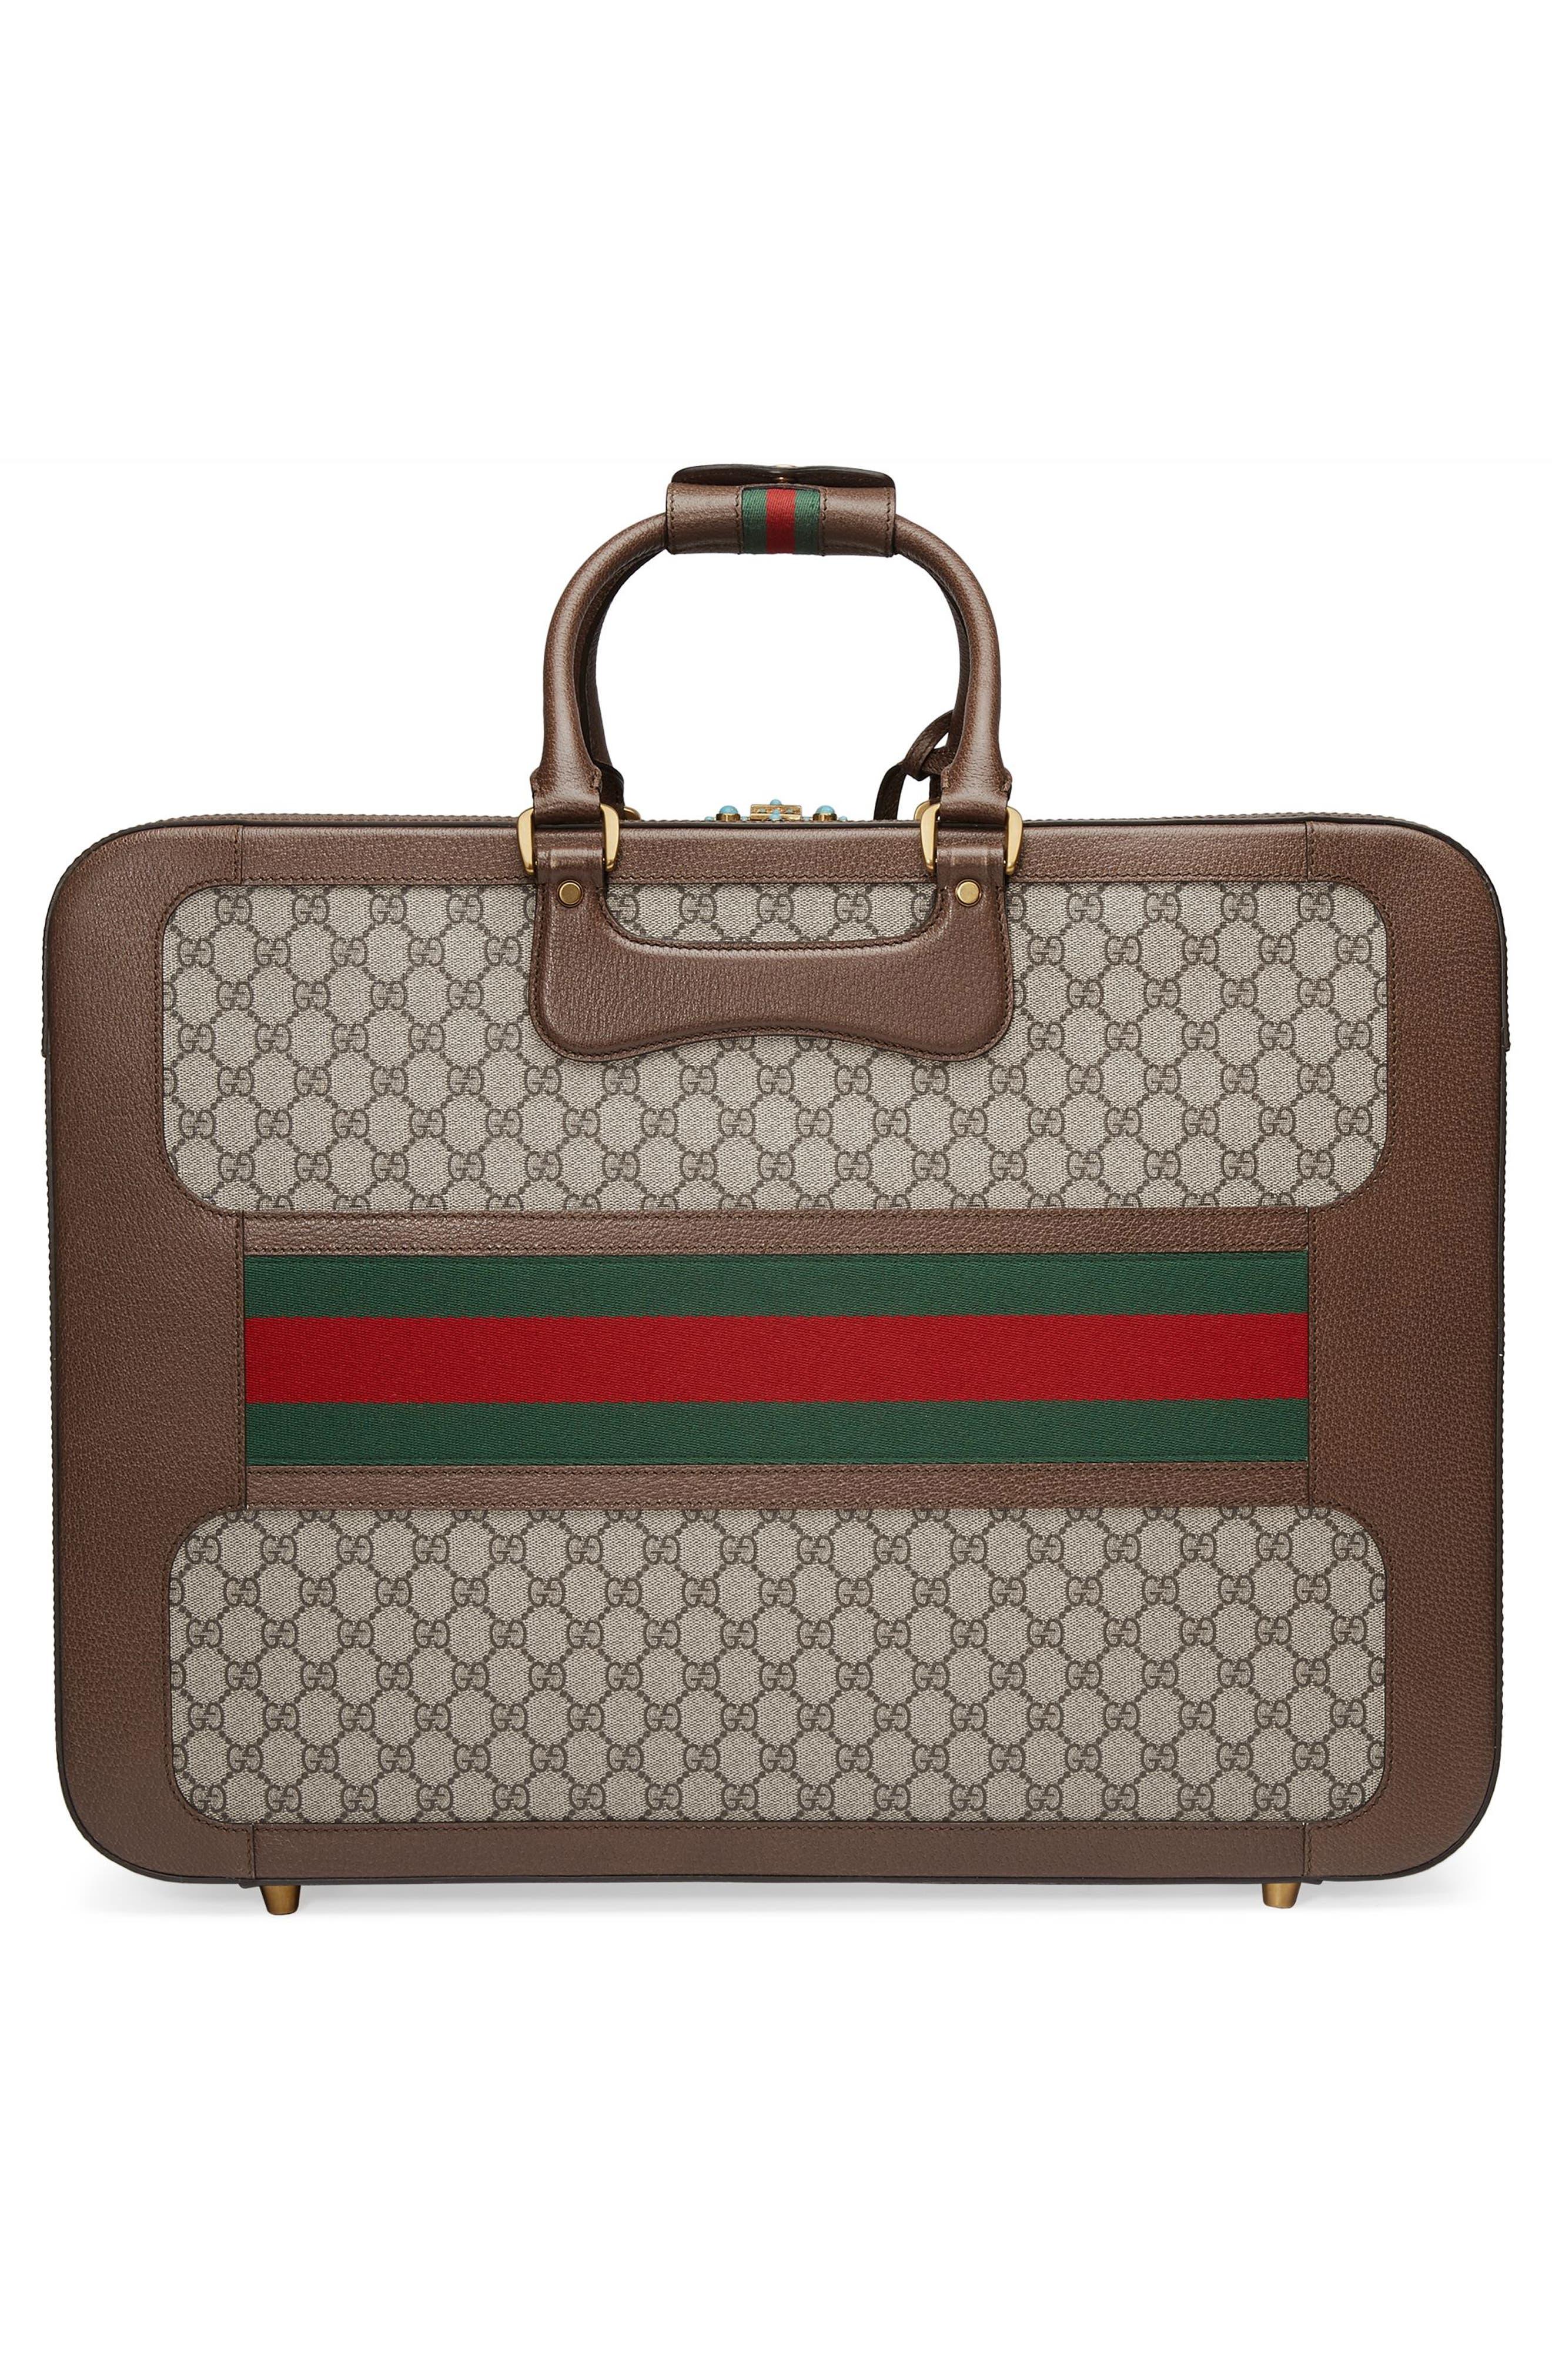 Large Echo GG Supreme Canvas & Leather Suitcase,                             Alternate thumbnail 2, color,                             283